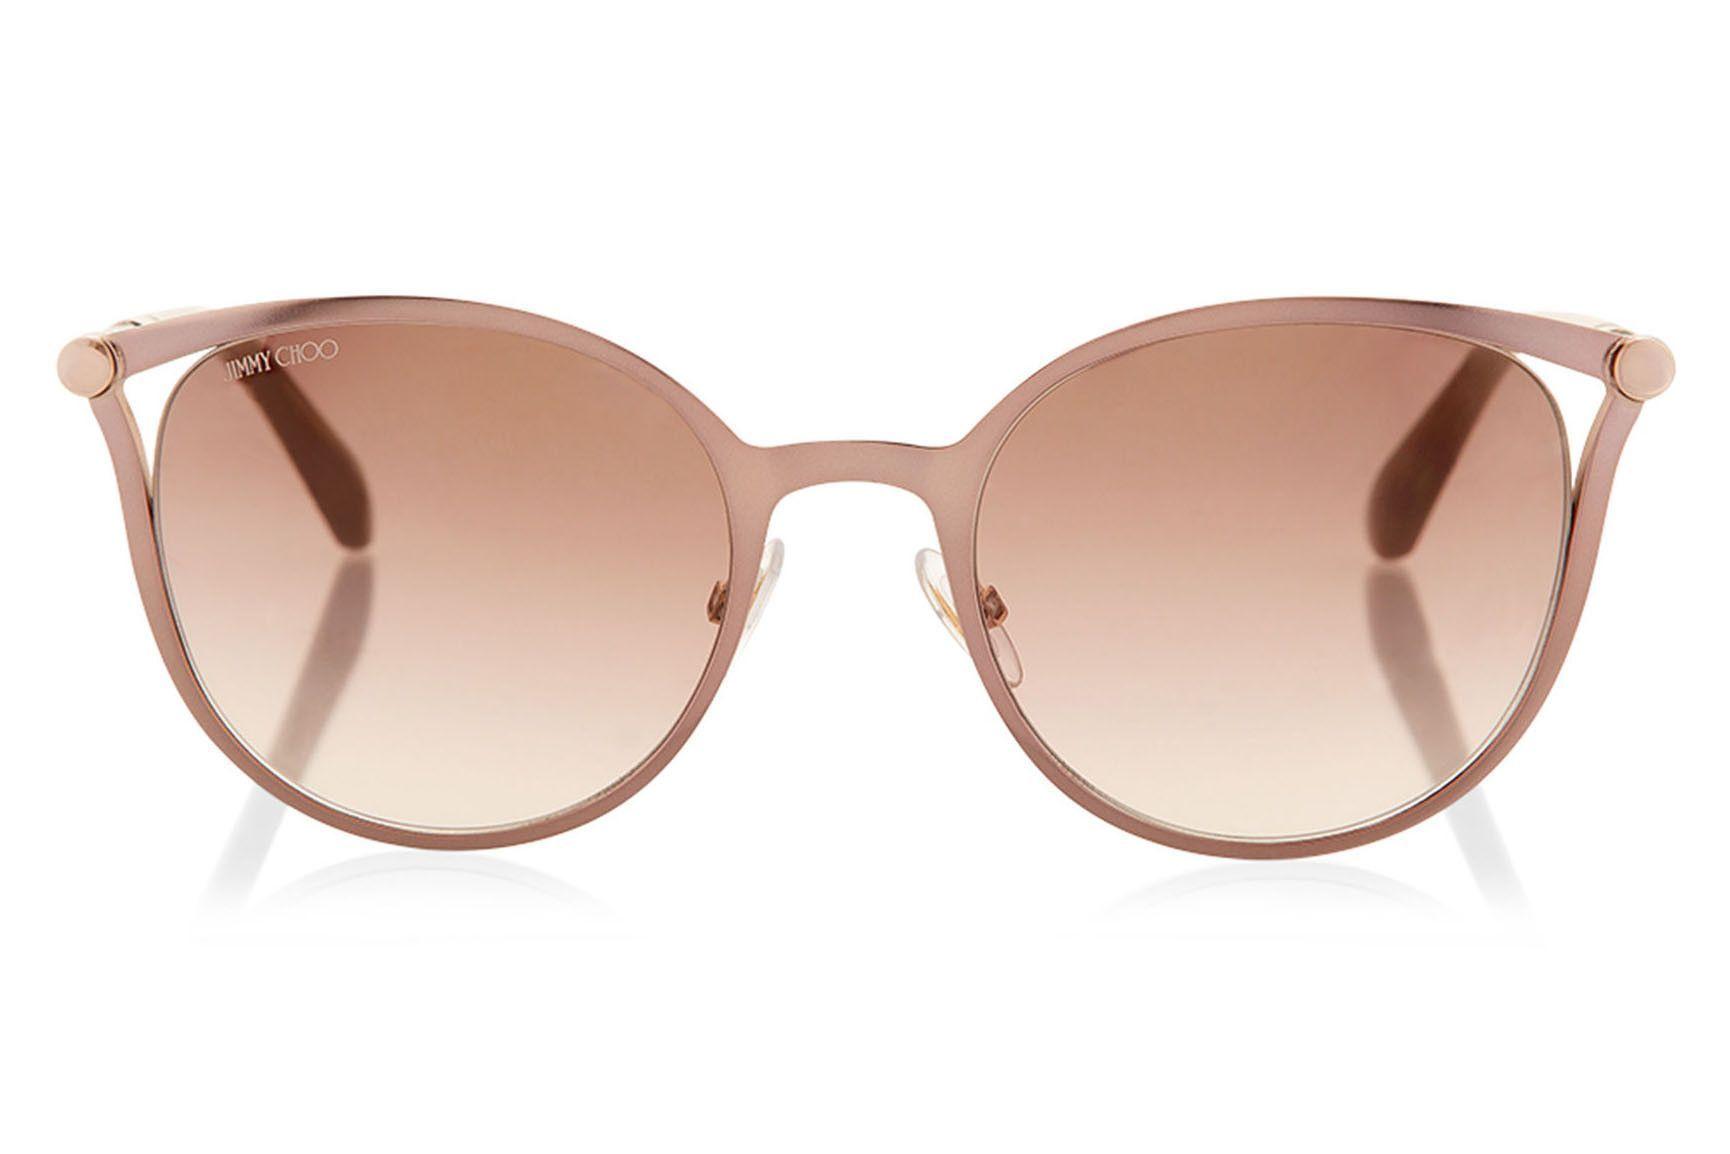 db40efcc4cb Jimmy Choo - Neiza Brown Rose Gold Cat-Eye Sunglasses